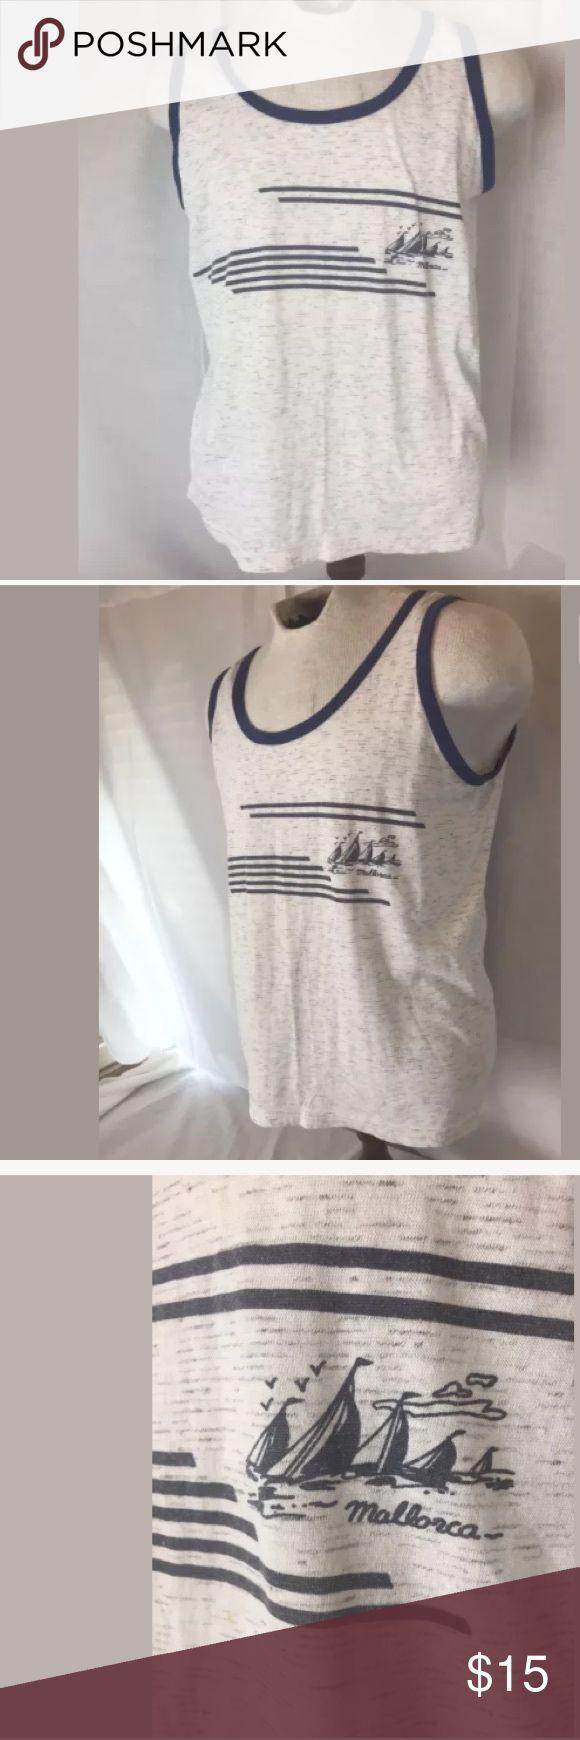 "Vtg 70s Fleck Tank Top shirt Sailboat (chest 42""+) Fantastic Vintage 70s  Mallorca Spain - Sailboats Tank Top  T Shirt   MEASUREMENTS:   Chest (pit to pit): 42""+  Sleeveless  Length: 25"" Vintage Shirts Tees - Short Sleeve"